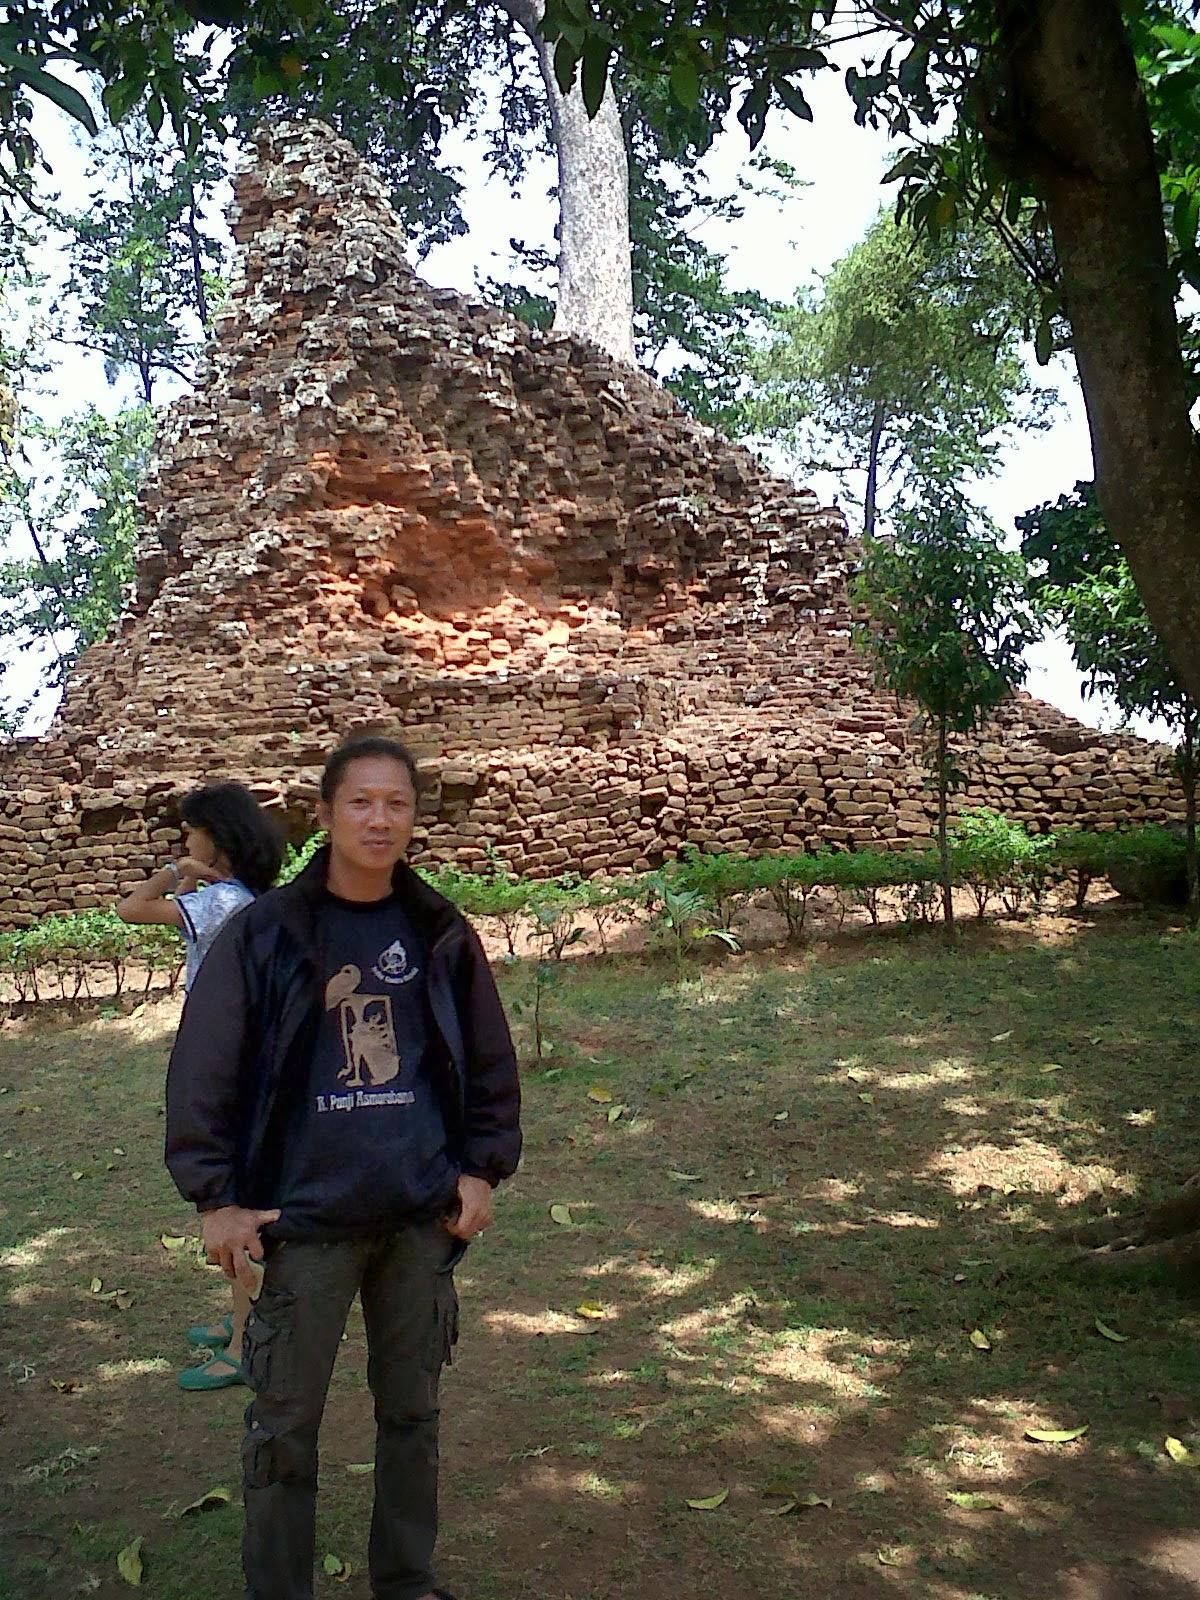 Sejarah Peristiwa Candi Lor Nganjuk Jawa Timur Kab